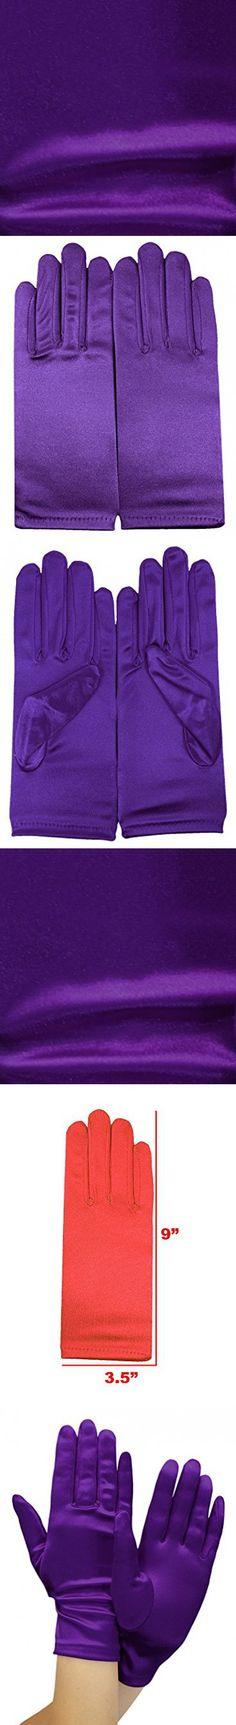 Enimay Women's Short Colored Satin Gloves Wedding Bridal Shower Formal Opera Purple